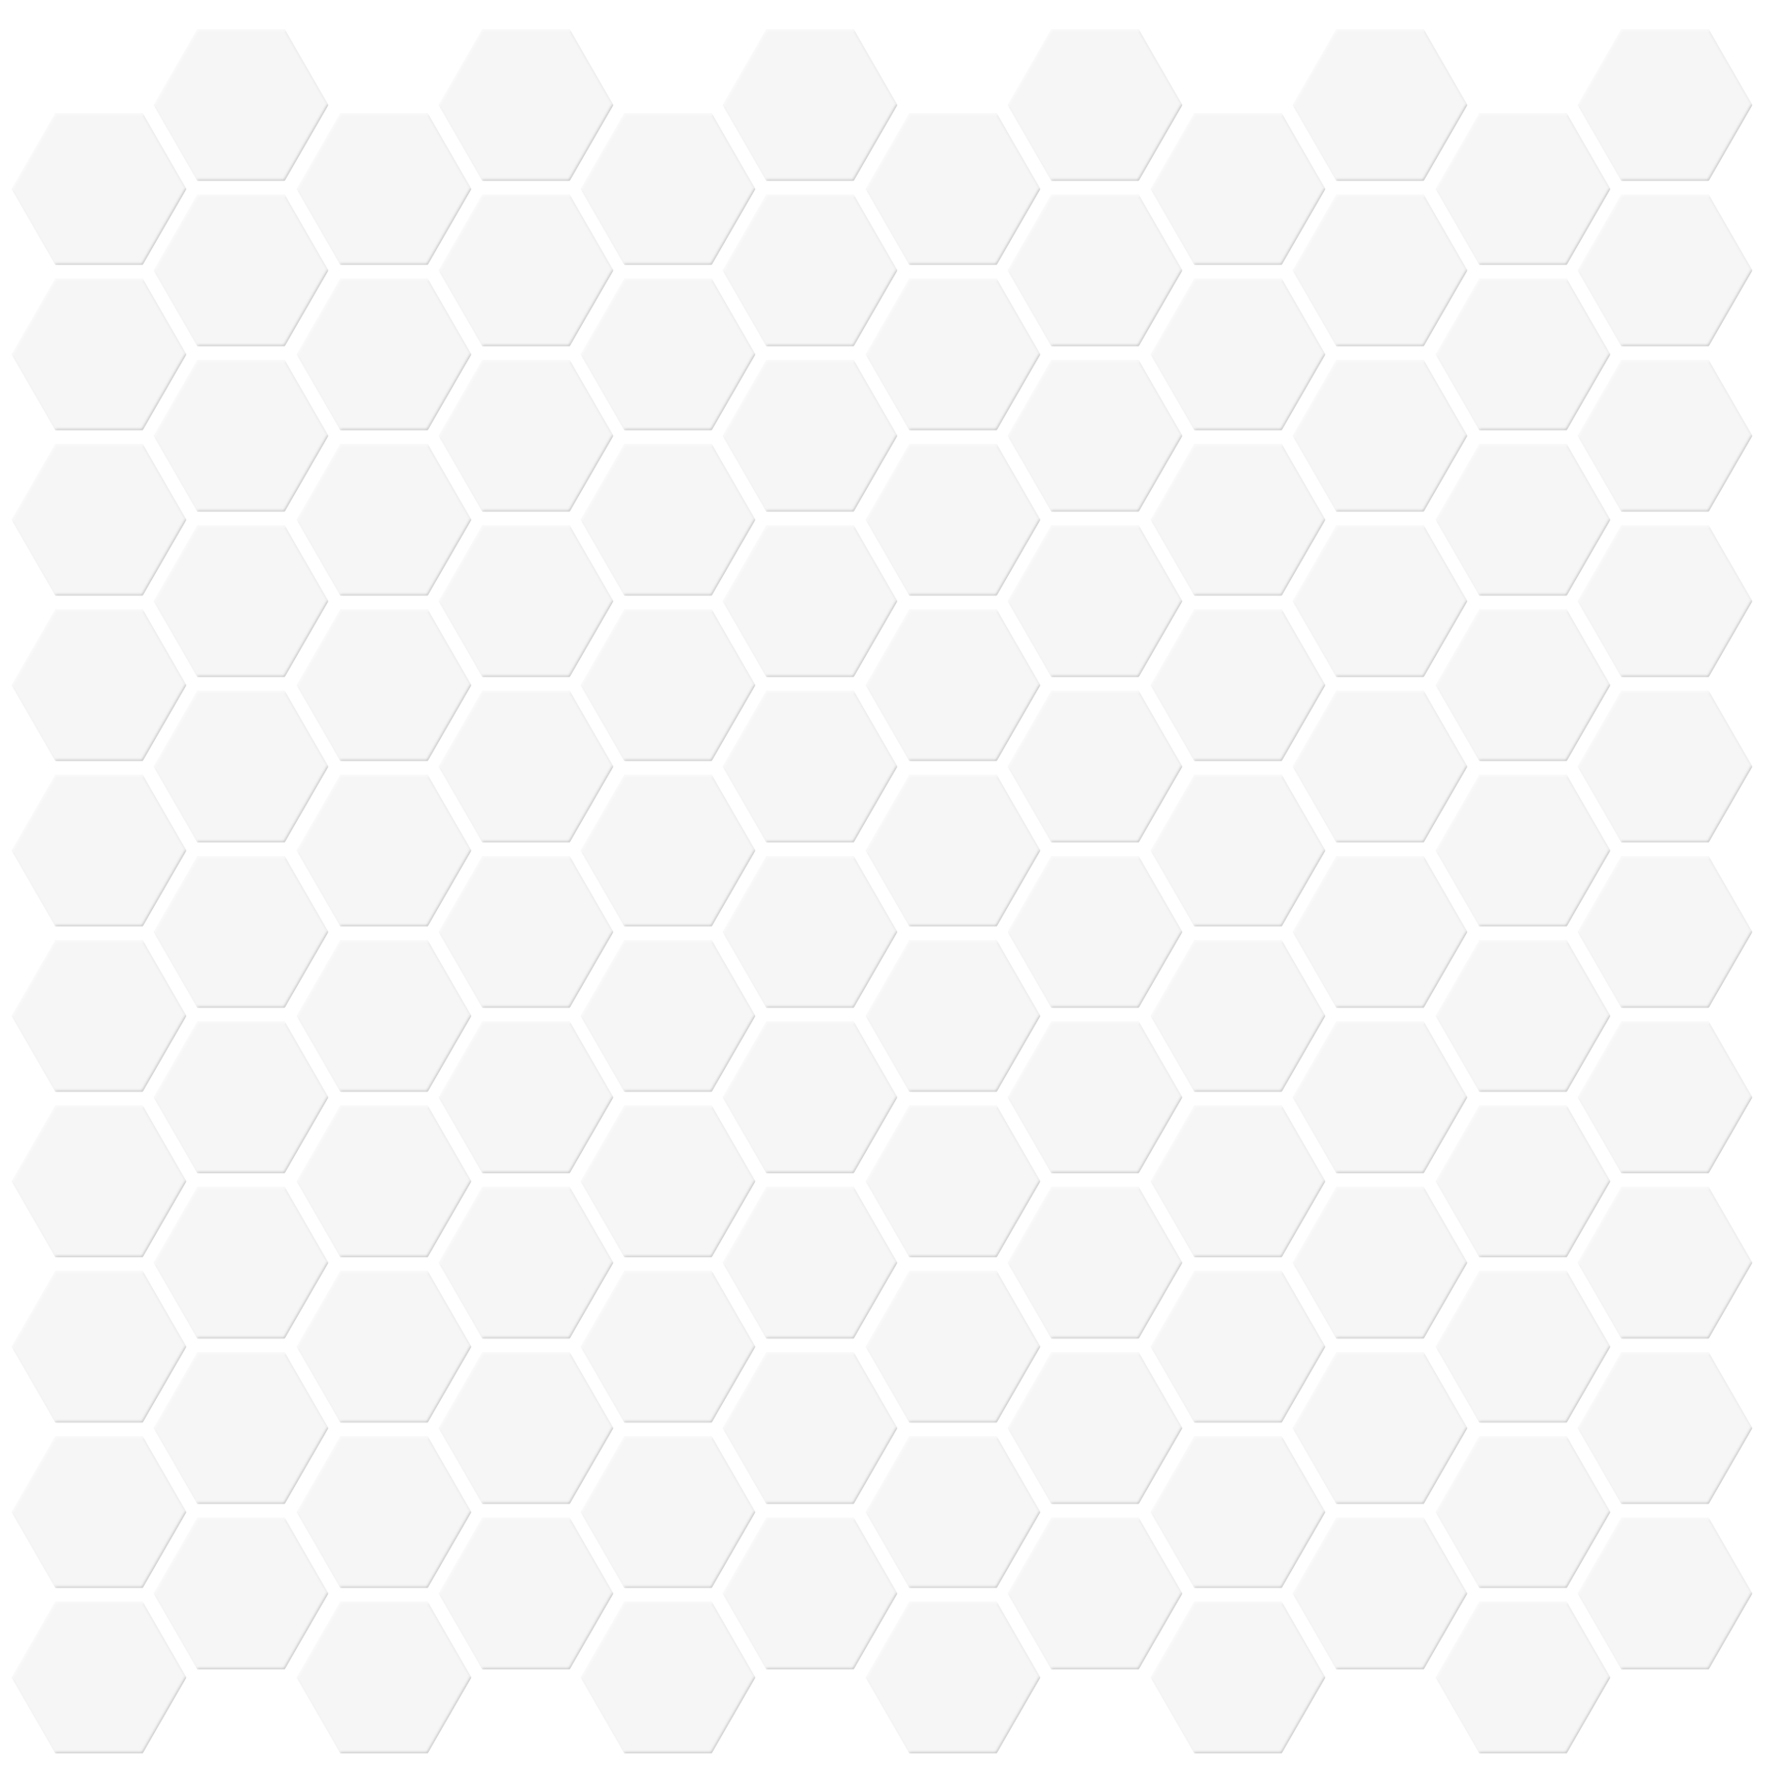 K53011480001VTE0, Miniworx, Valkoinen, lattia